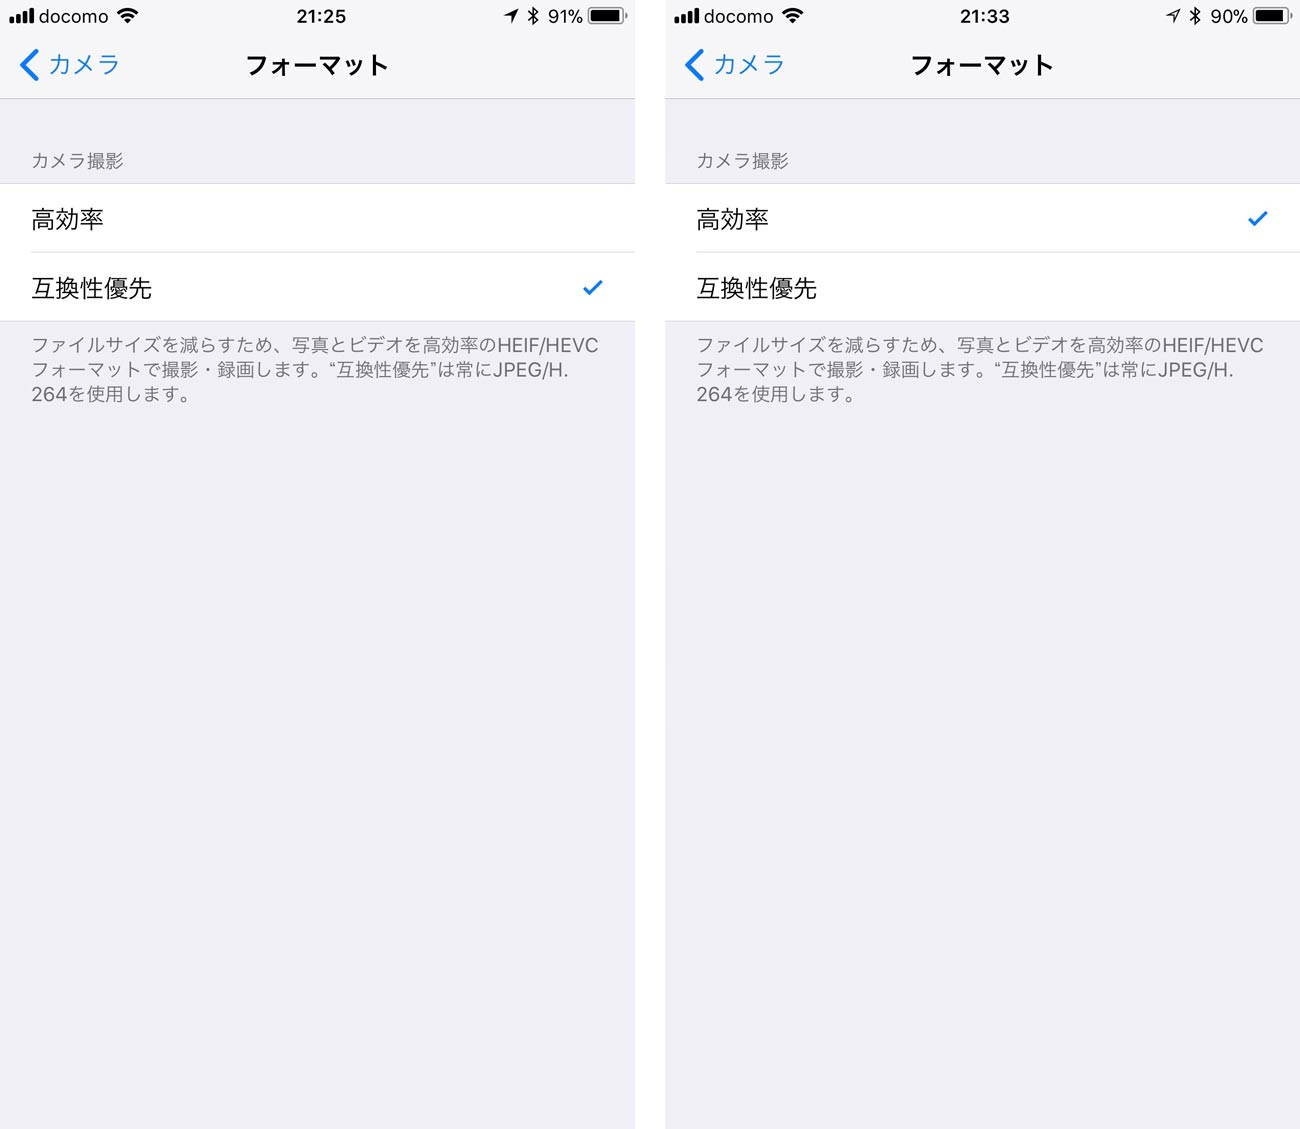 iOS11 カメラ フォーマット 高効率/互換性優先